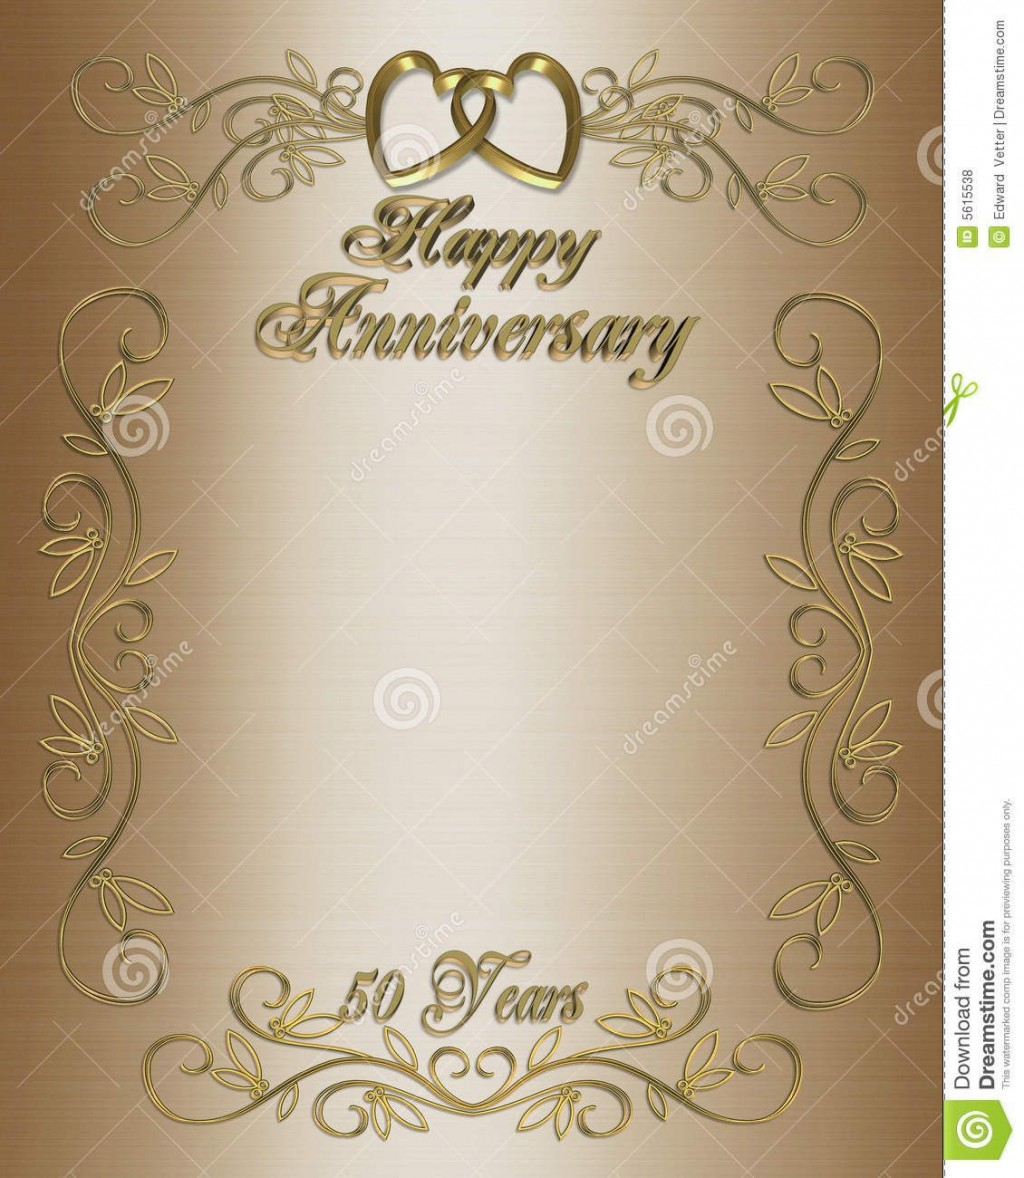 006 Wonderful Golden Wedding Anniversary Invitation Template Free High Def  50th Microsoft Word DownloadLarge